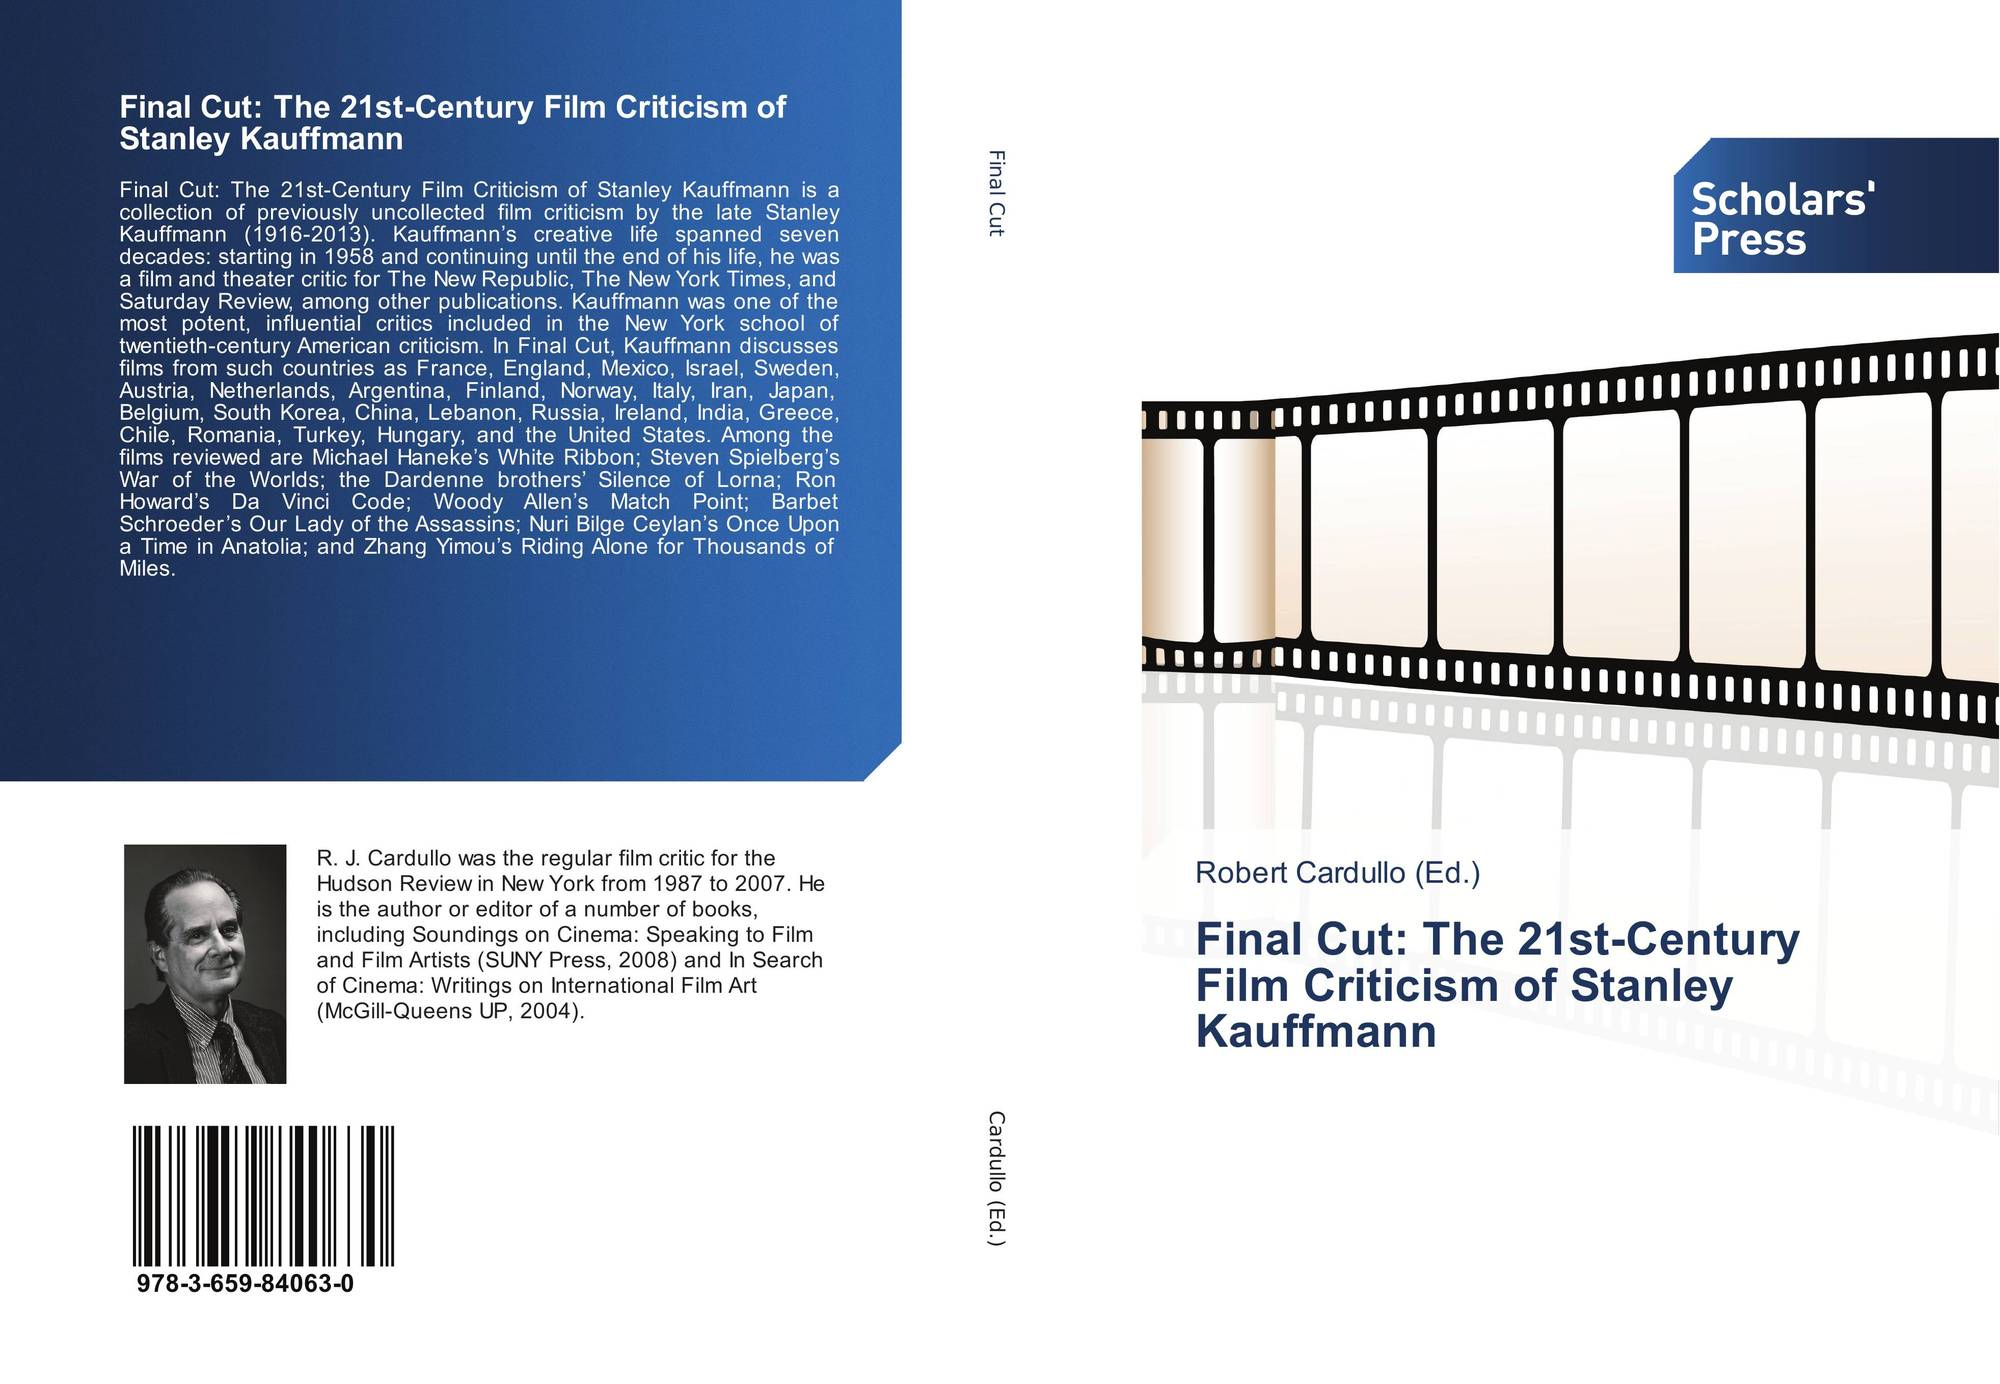 Final Cut The 21st Century Film Criticism Of Stanley Kauffmann 978 3 659 84063 0 3659840637 9783659840630